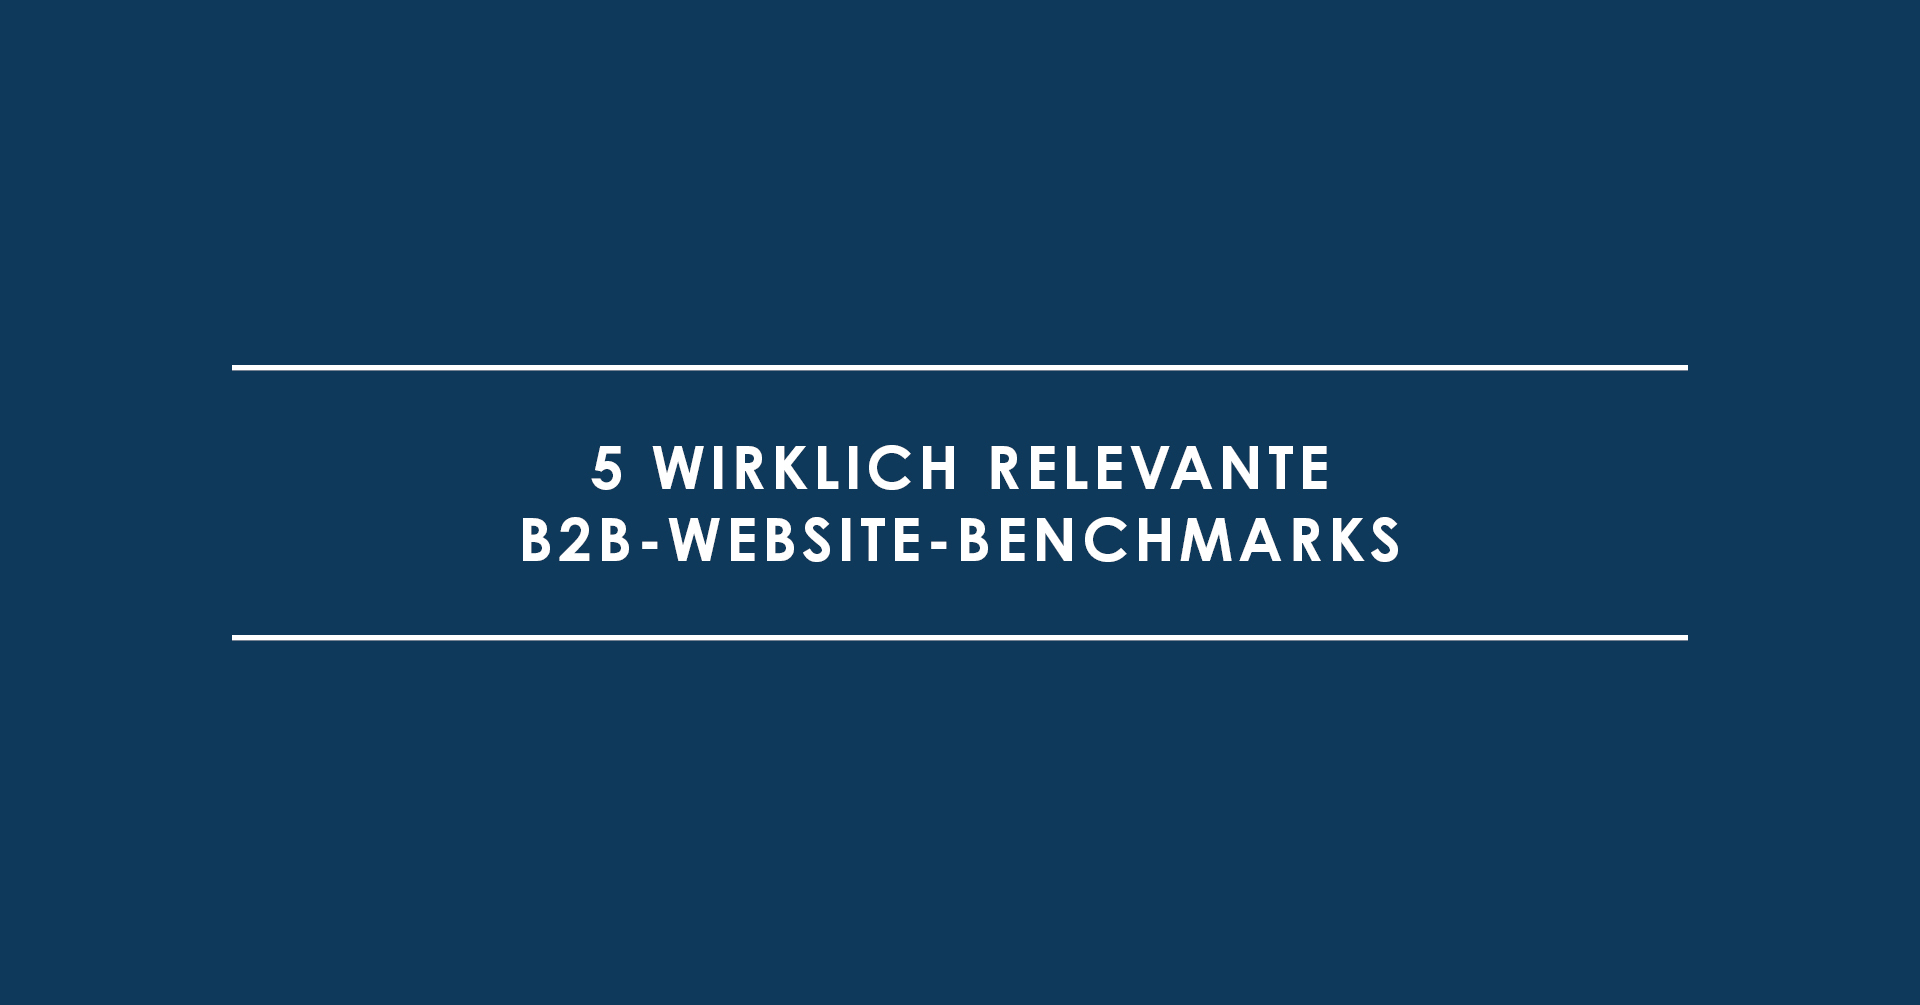 5 wirklich relevante B2B-Website-Benchmarks